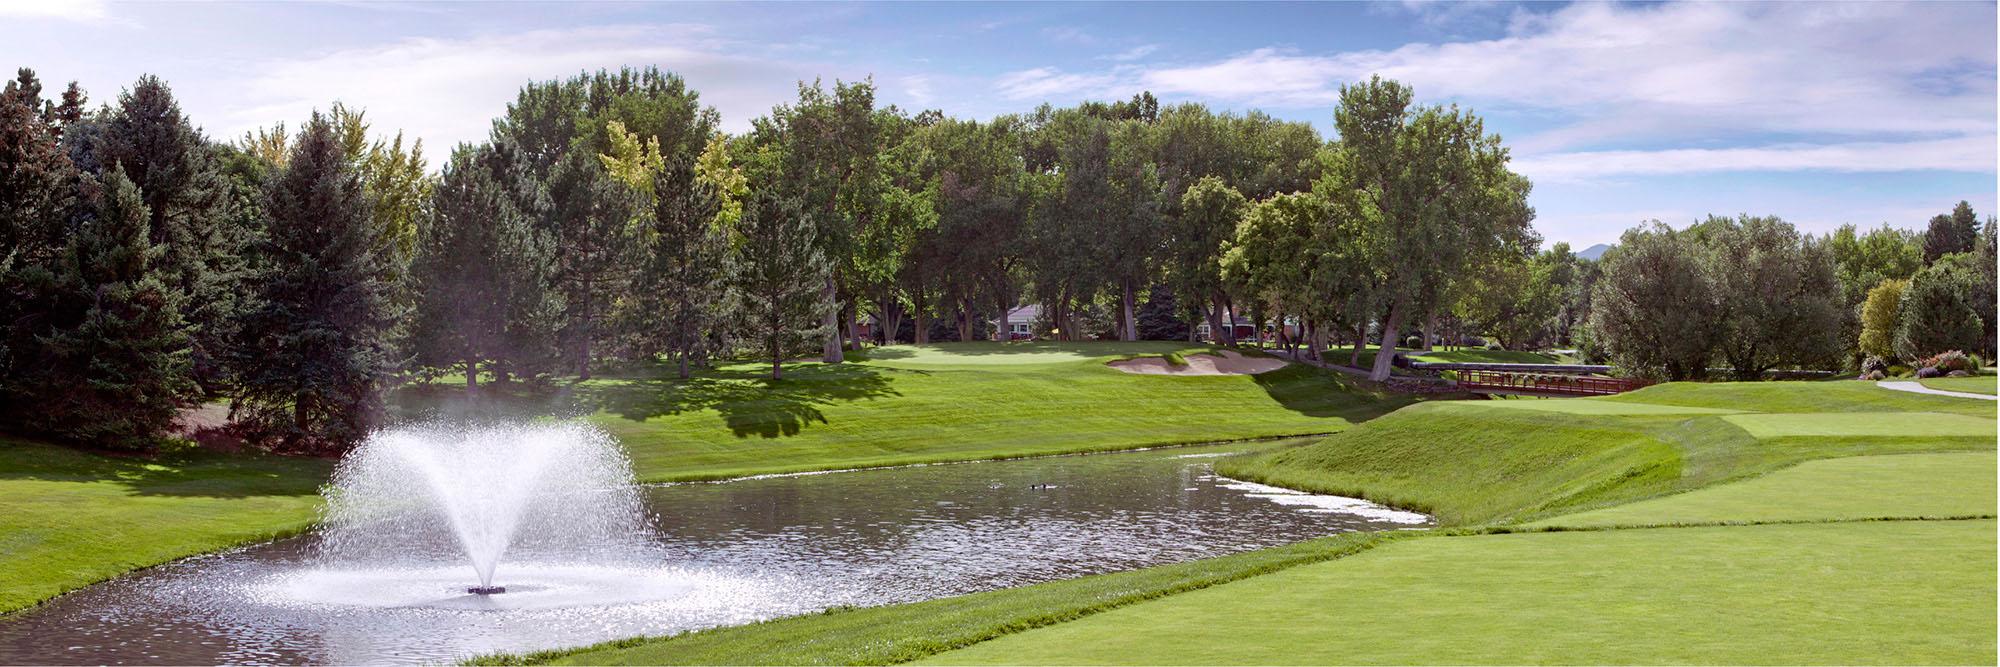 Golf Course Image - Columbine Country Club No. 10